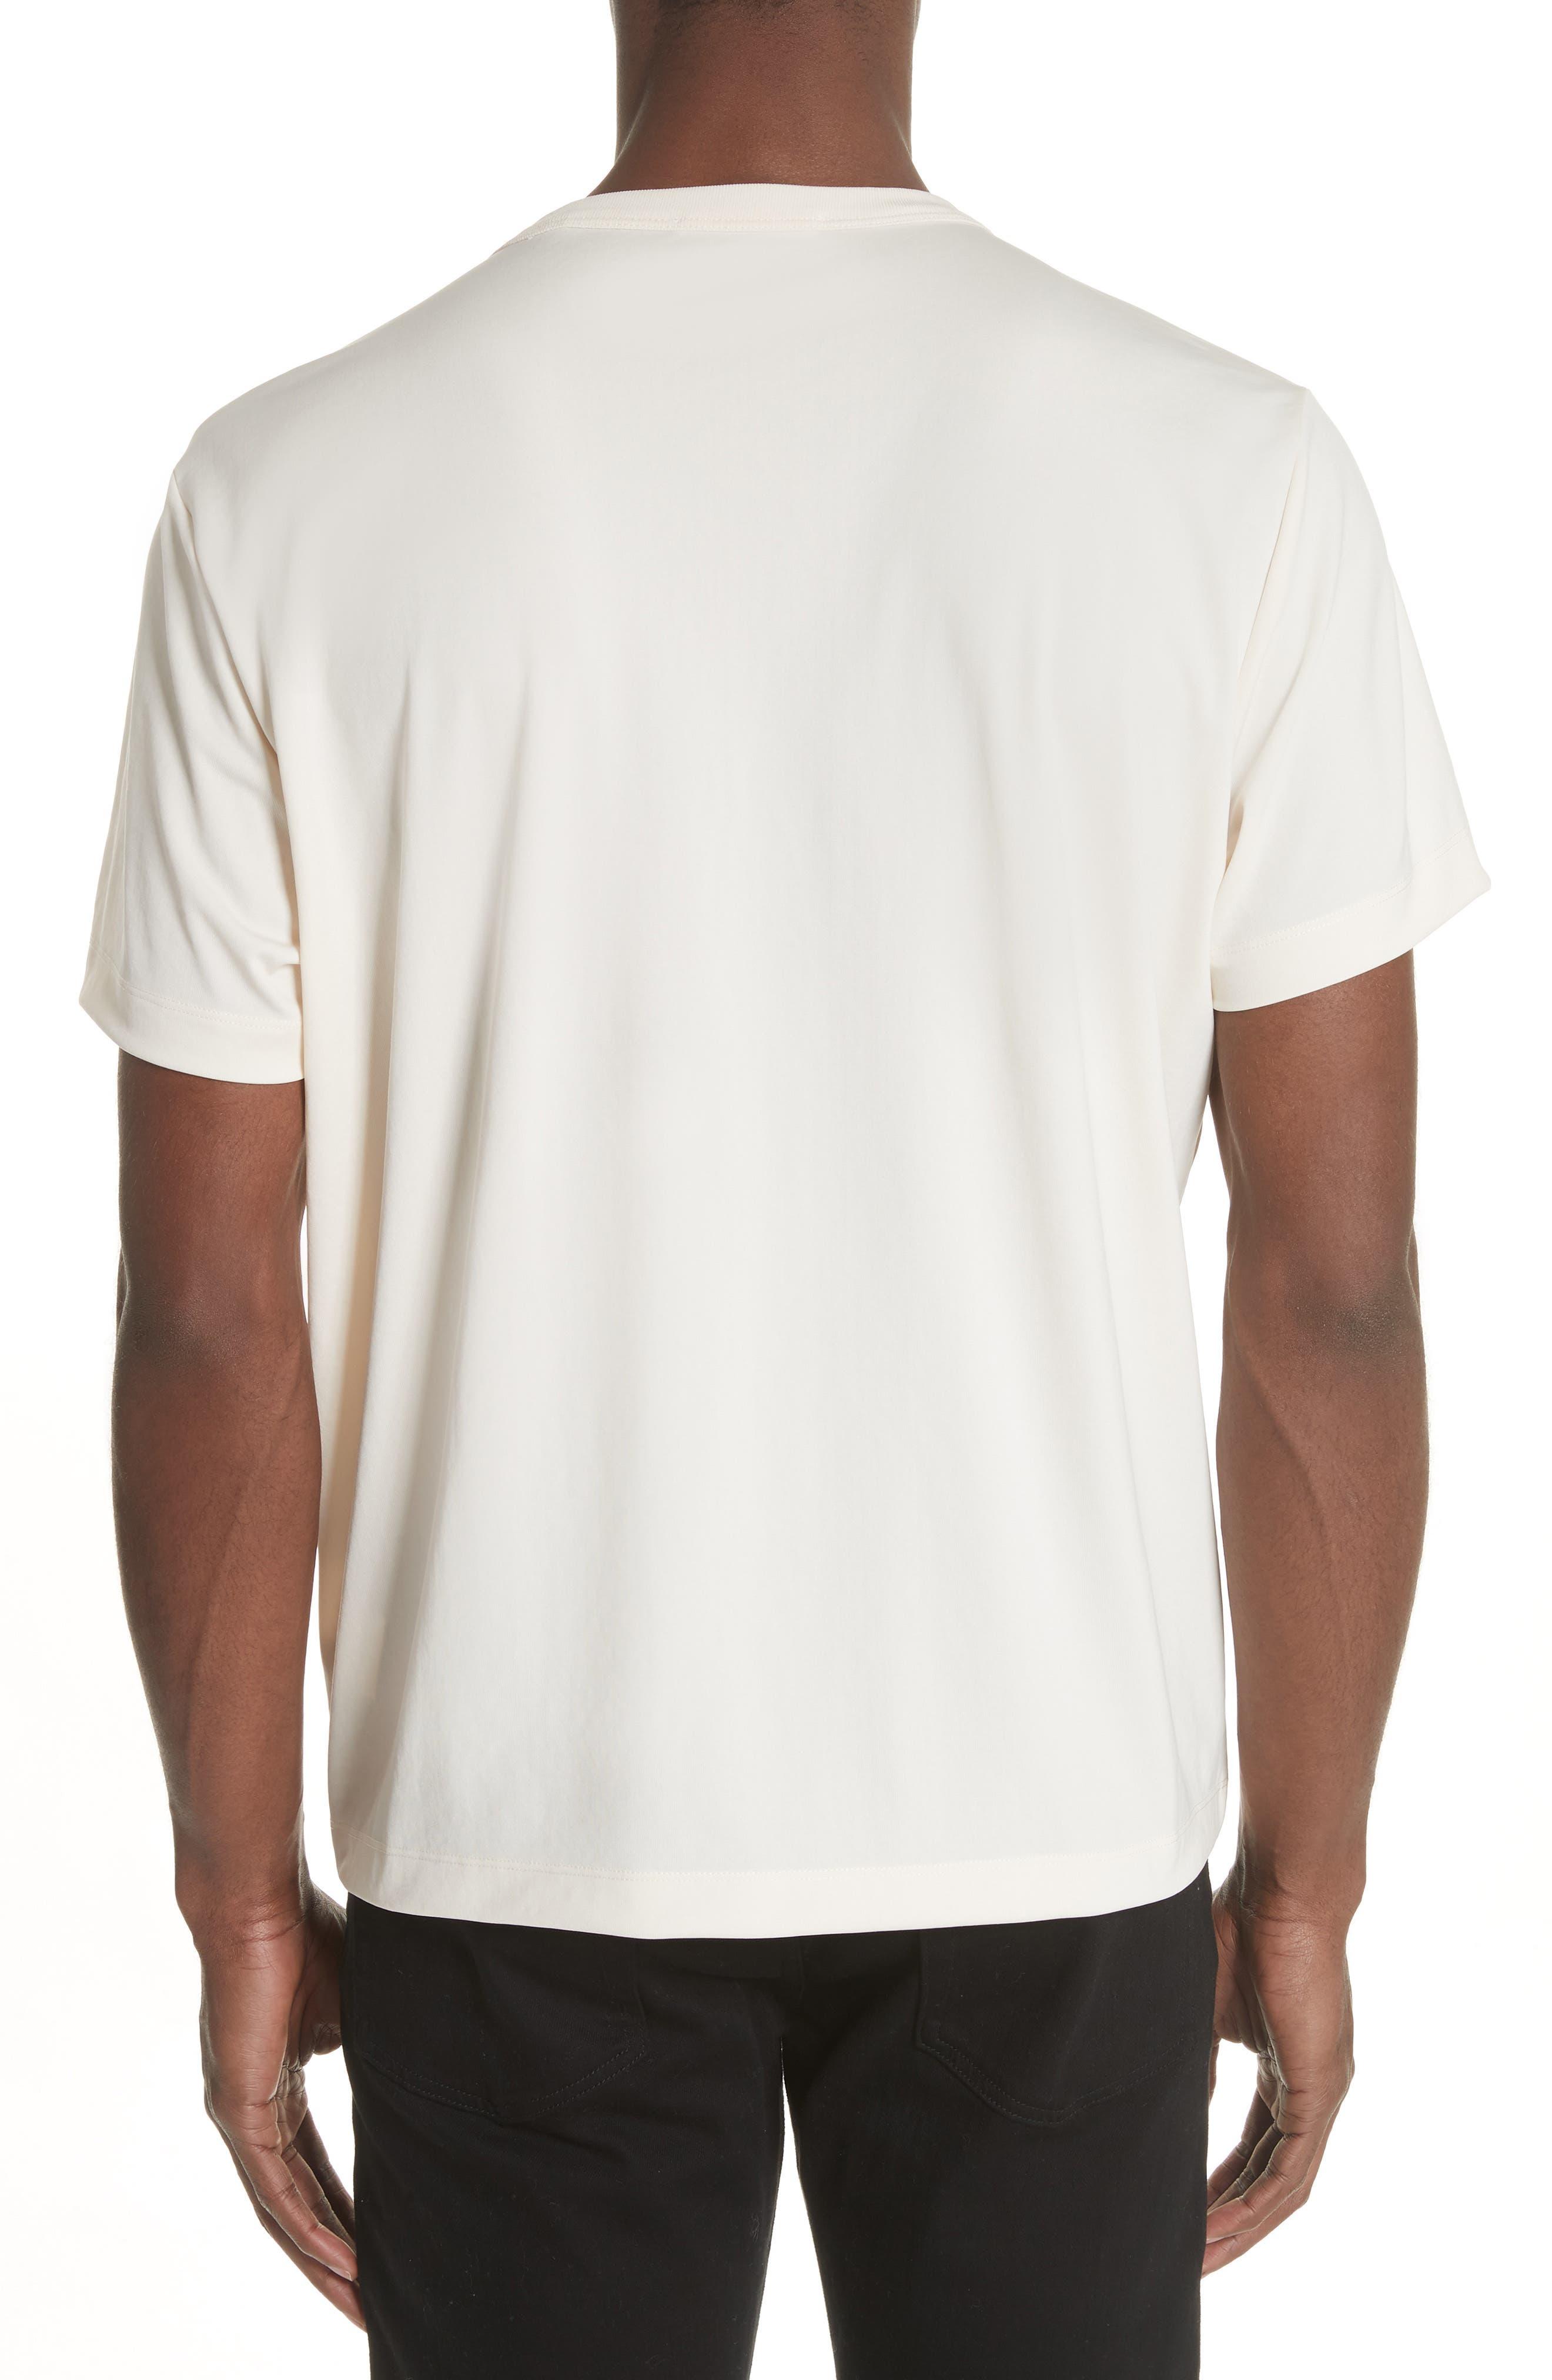 Trademark Graphic T-Shirt,                             Alternate thumbnail 2, color,                             100